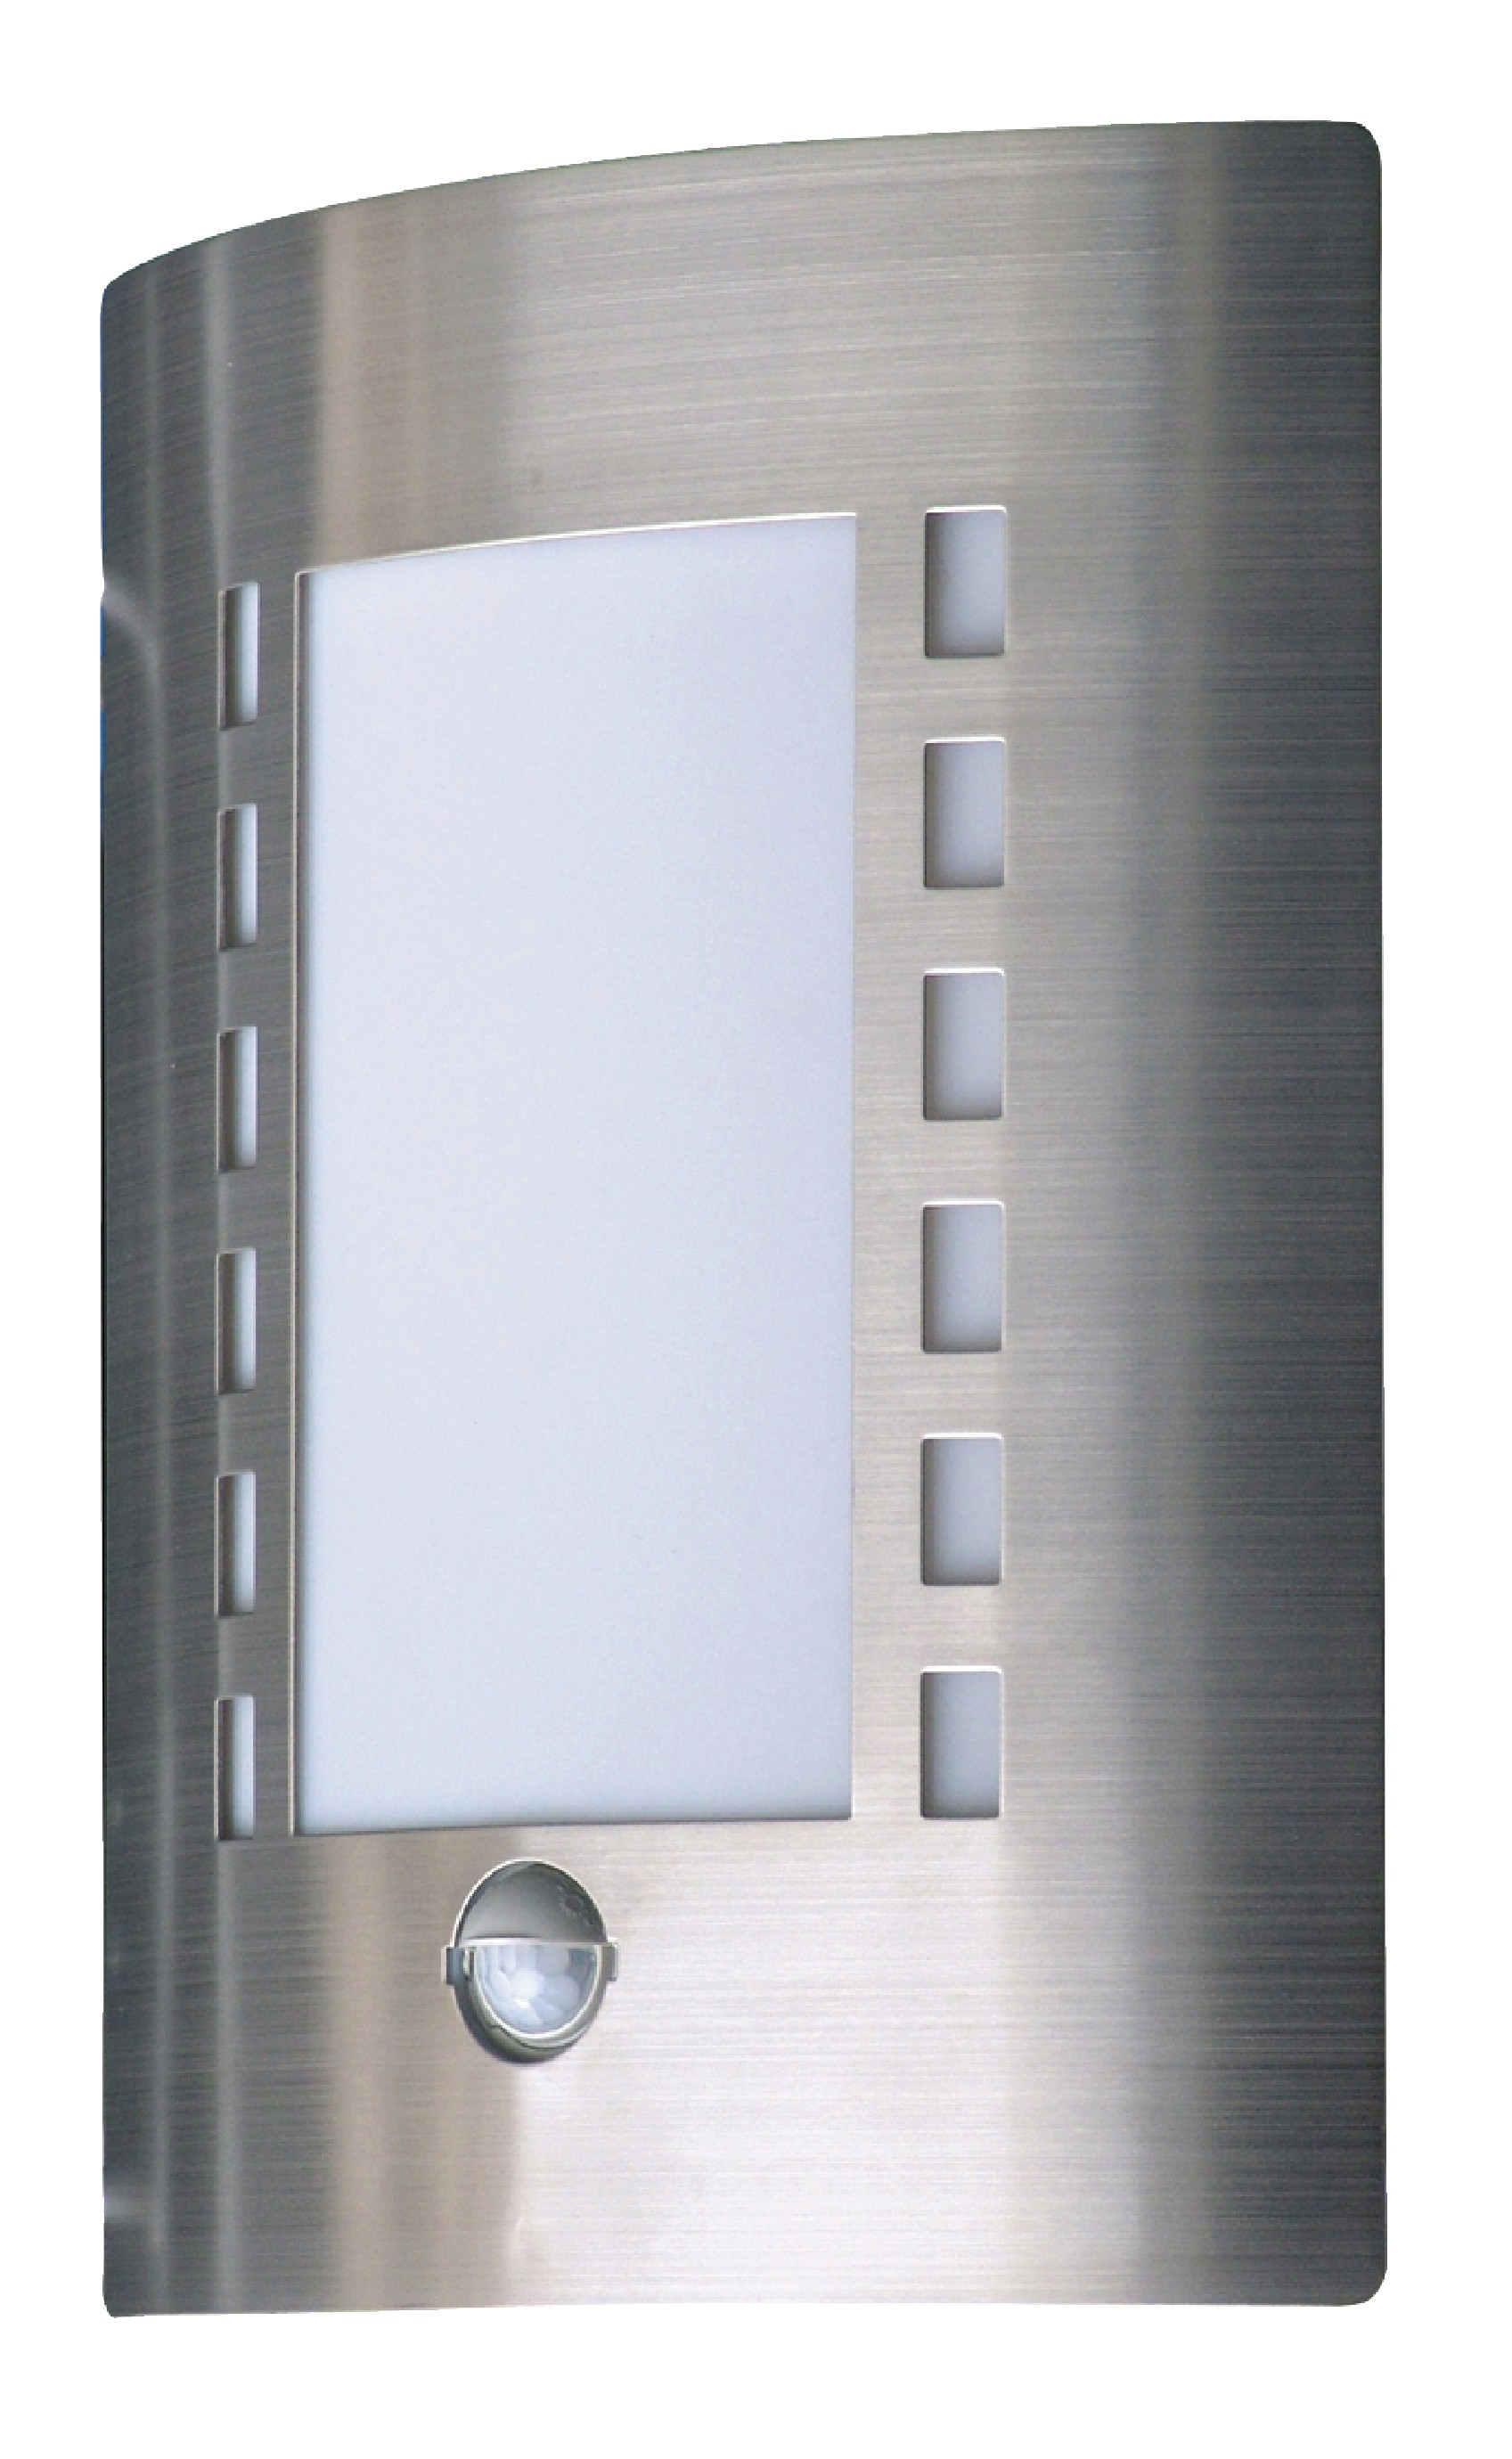 Venkovní nástěnné svítidlo E27 PIR Ranex Messina RA-OUTDOOR4